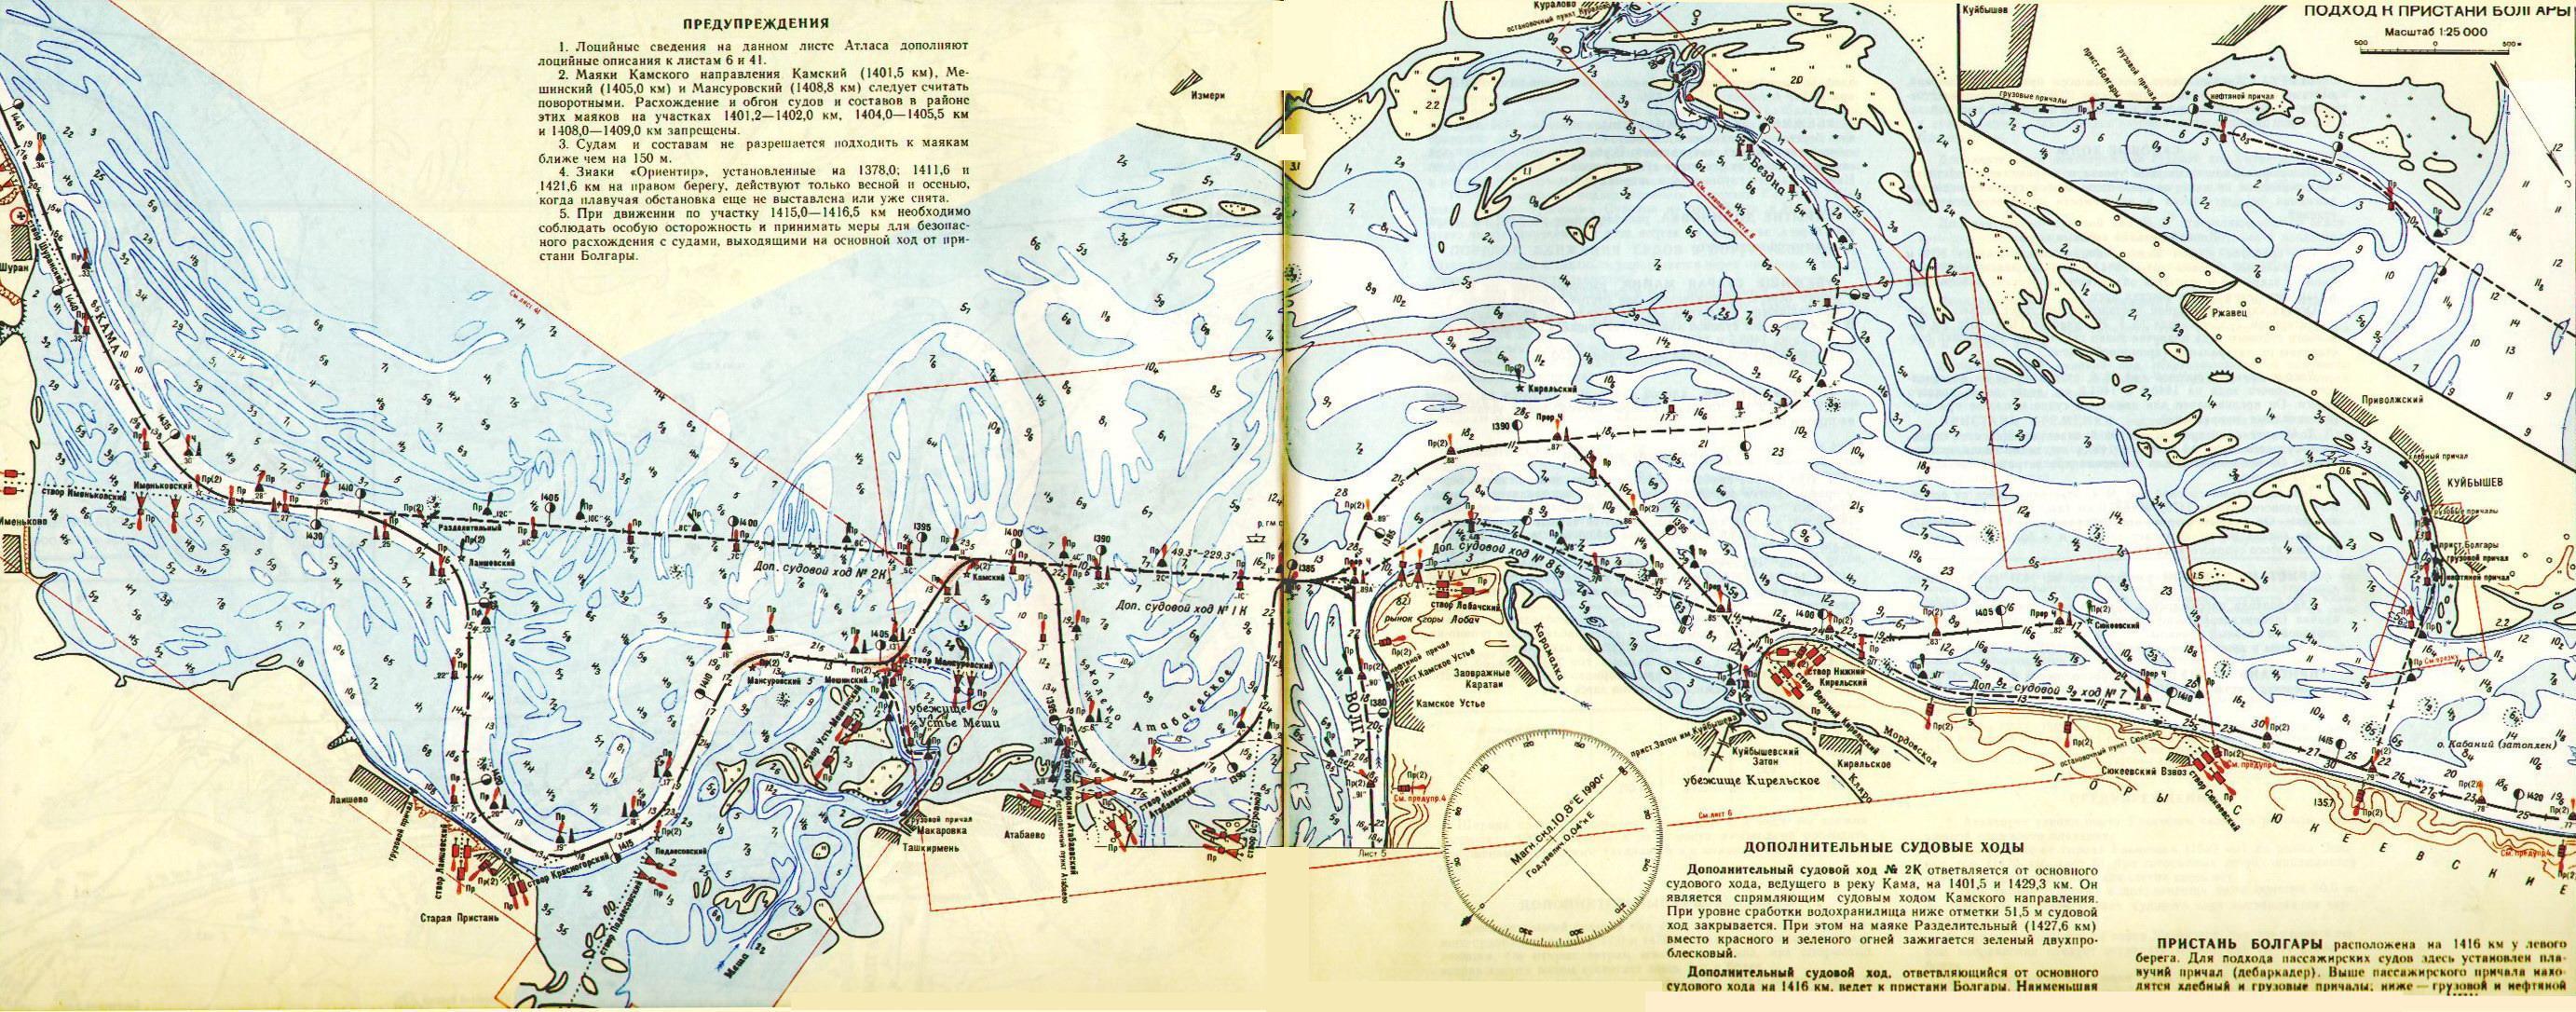 Карты Лоции Днепра Для Навител Для Андроид